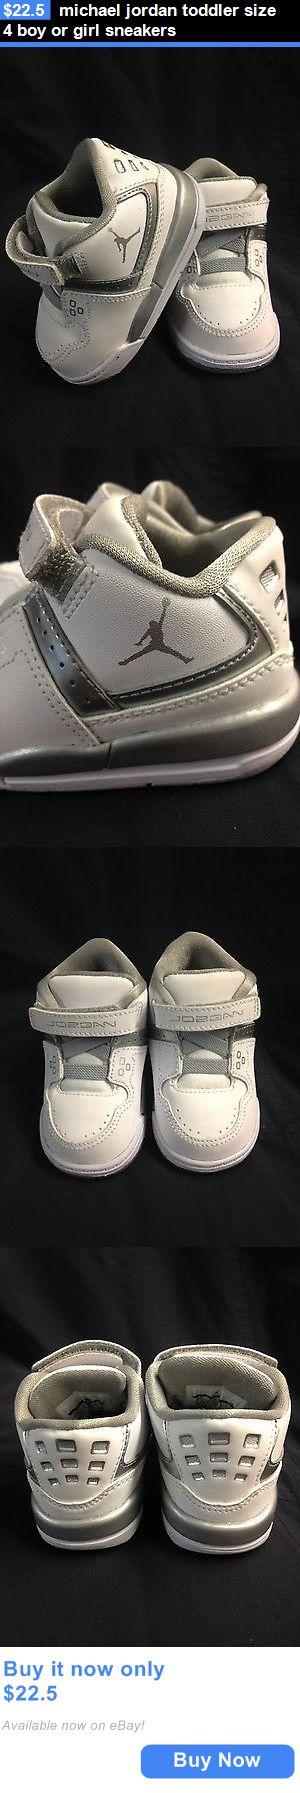 Michael Jordan Baby Clothing: Michael Jordan Toddler Size 4 Boy Or Girl Sneakers BUY IT NOW ONLY: $22.5